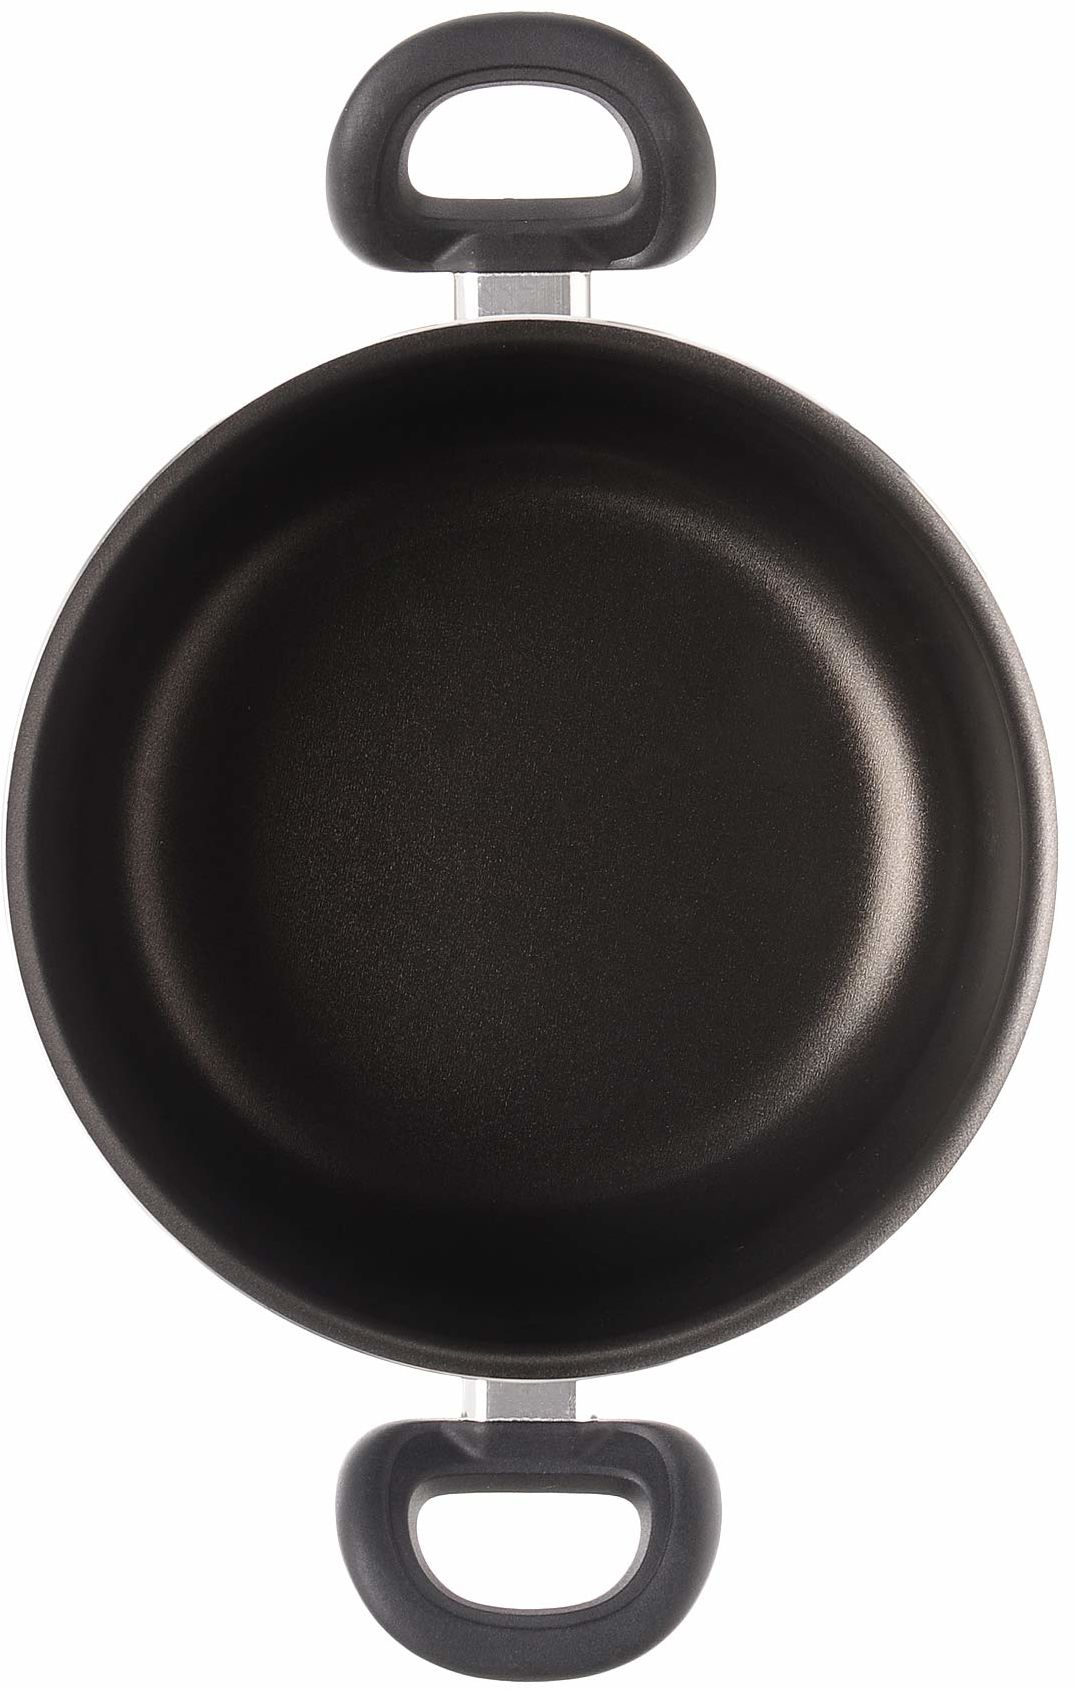 Alluflon Cuisina rondel 24 cm, 4,9 l, aluminium klasy spożywczej